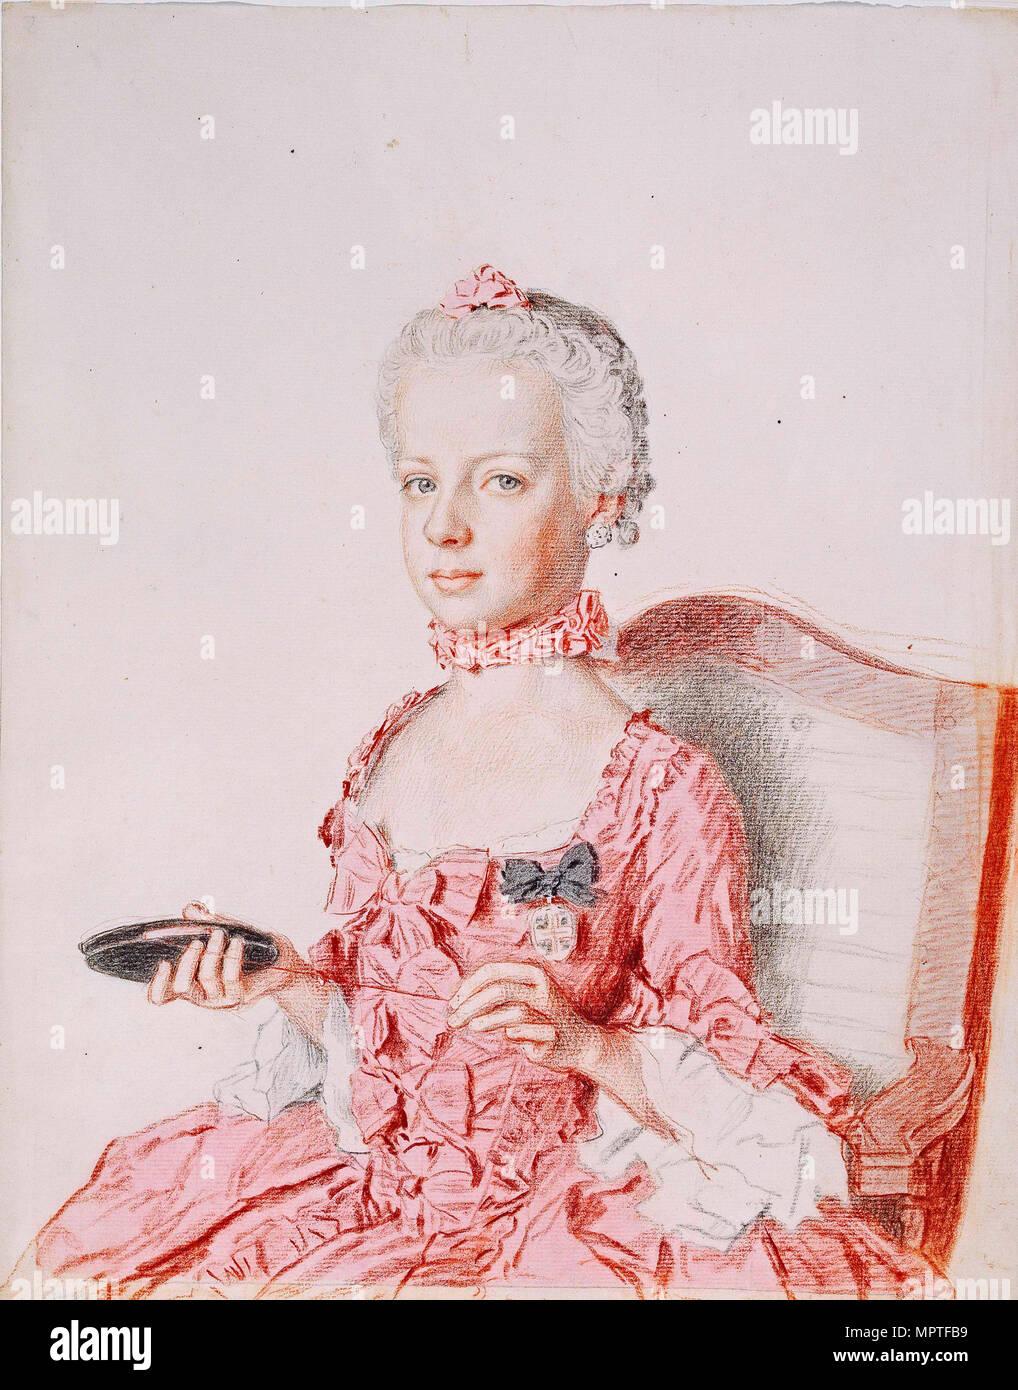 Marie Antoinette, Archduchess of Austria, 1762. Stock Photo